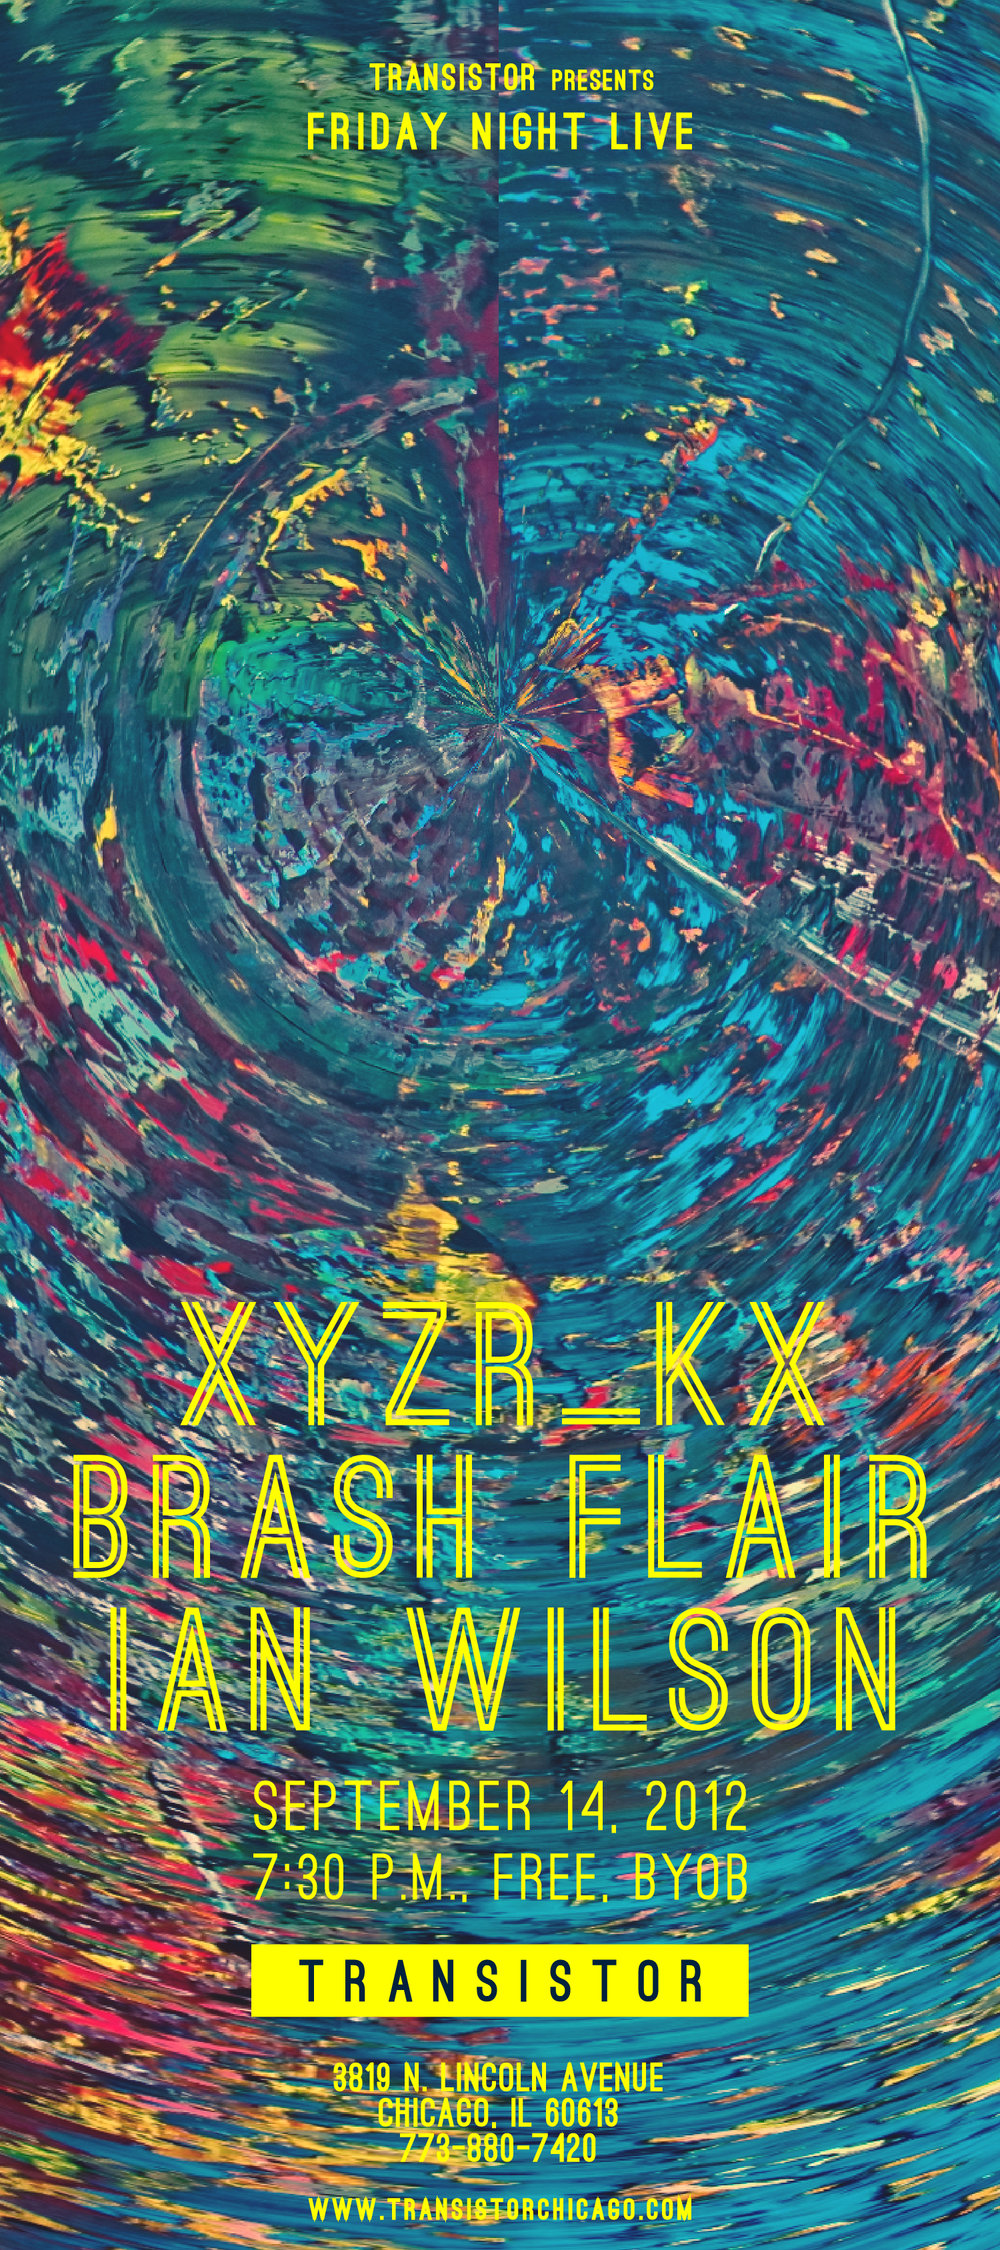 xyzr_kx_final-01-01.jpg